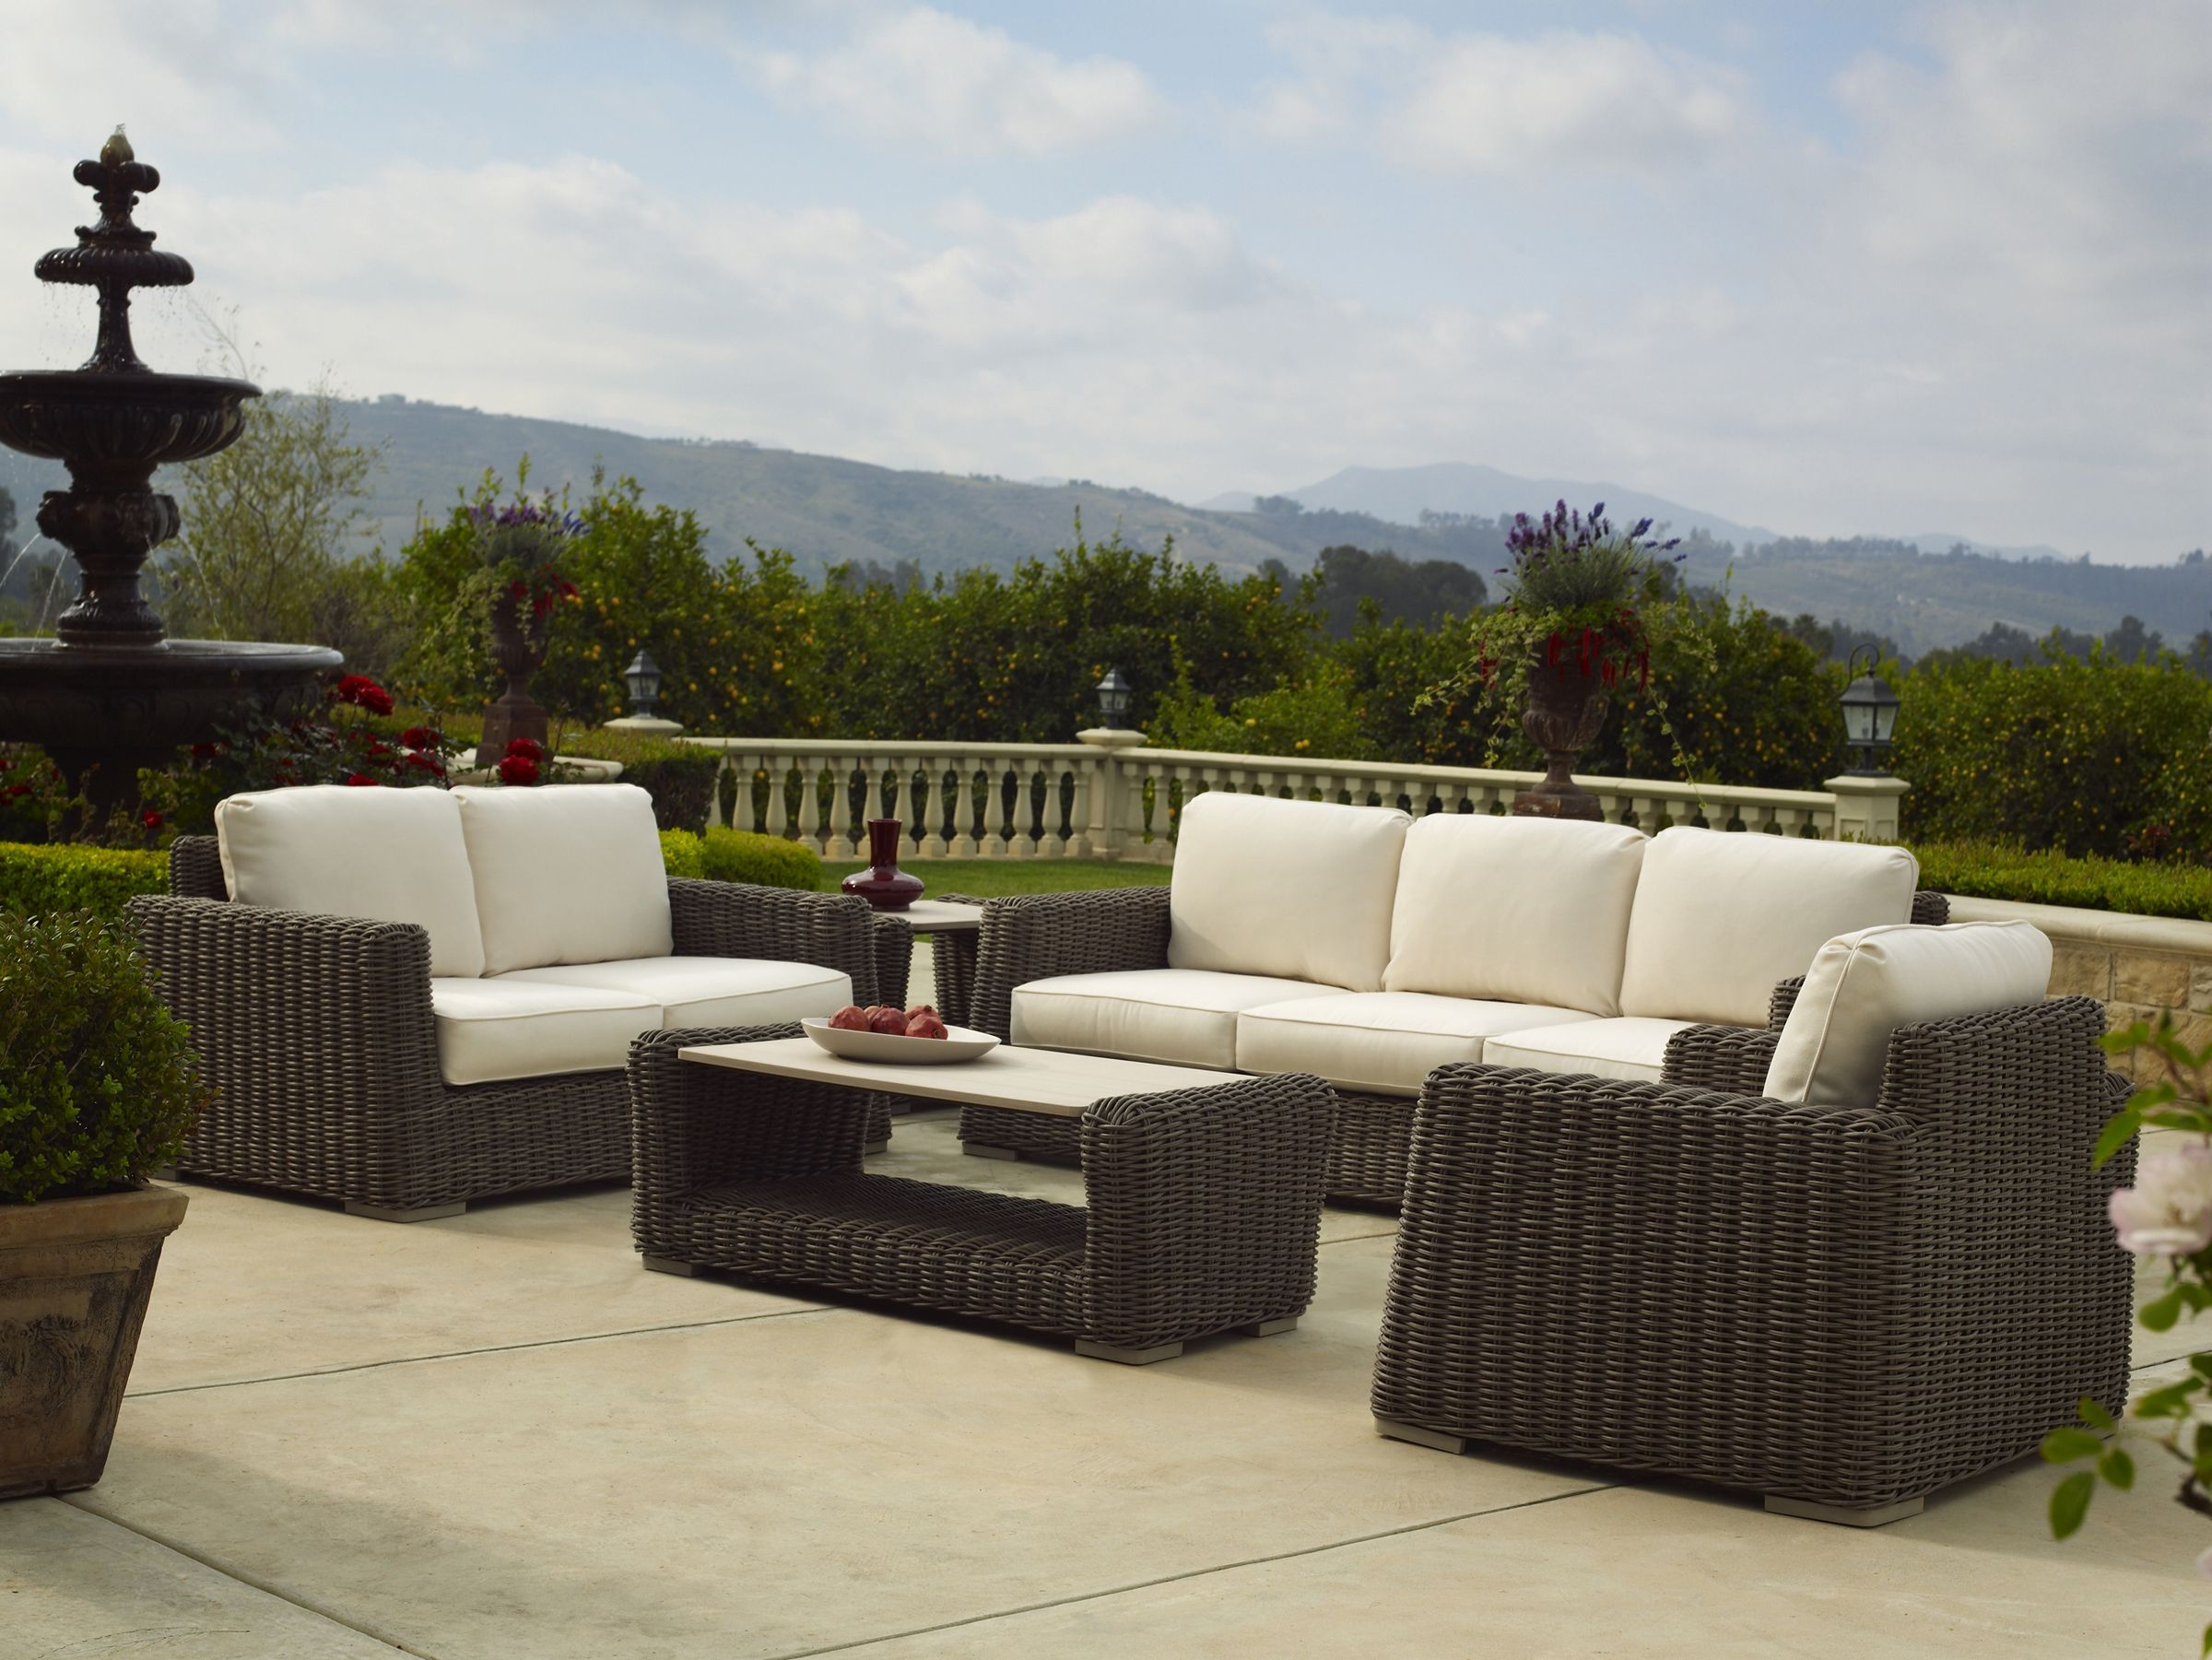 Brown Jordan Luxury Patio Furniture Luxury Outdoor Furniture